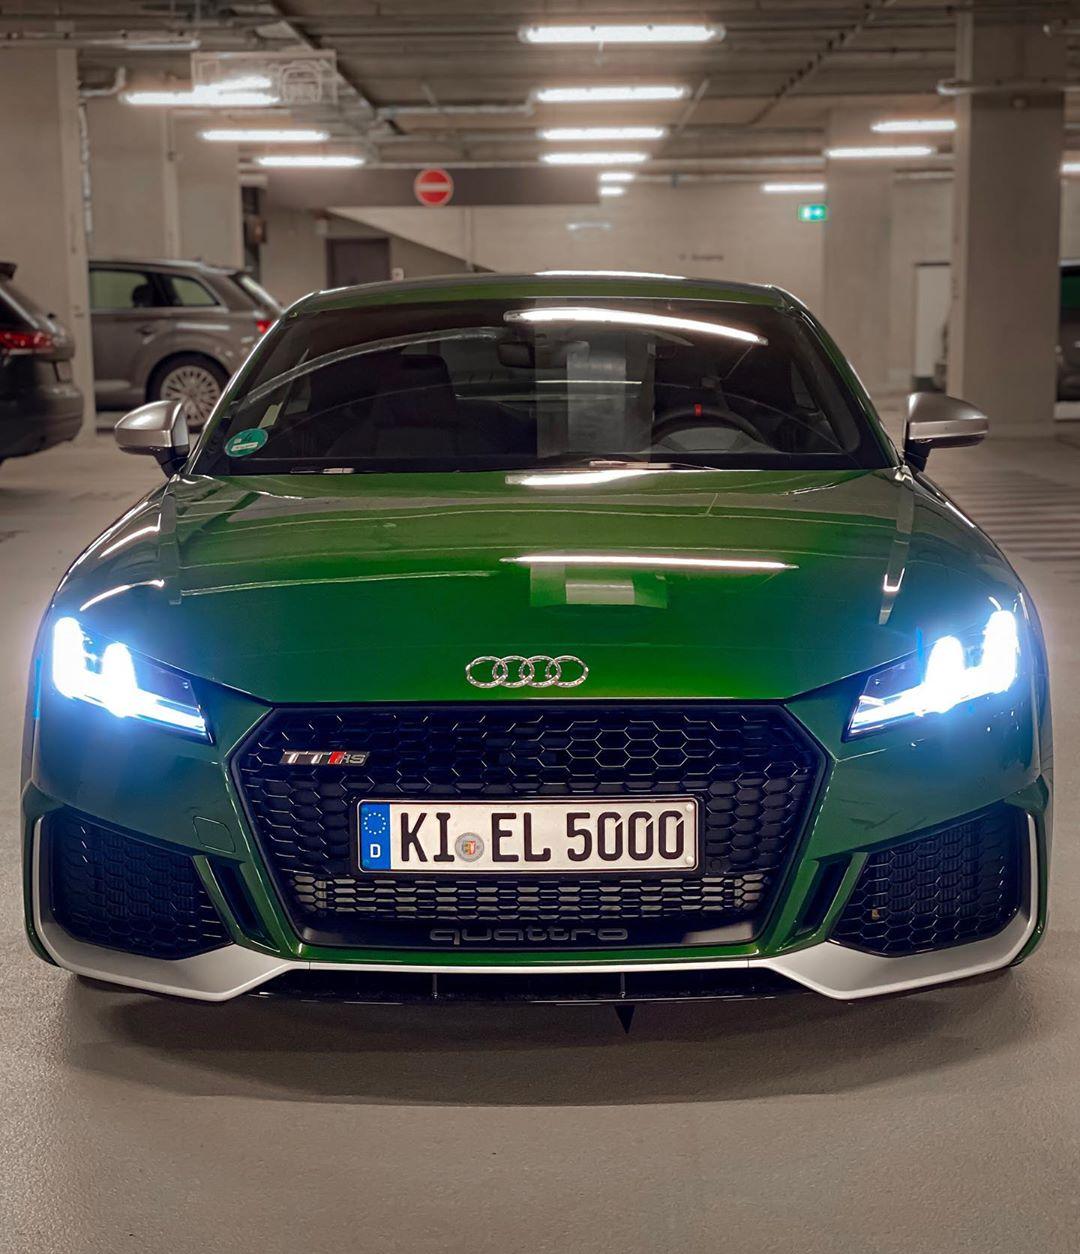 HULK meets ELFIE🤩 #audisport #ttrs #audittrs #ttrsfacelift #rs #sonomagrün #sonomagreen #automannsgarage #automanntv